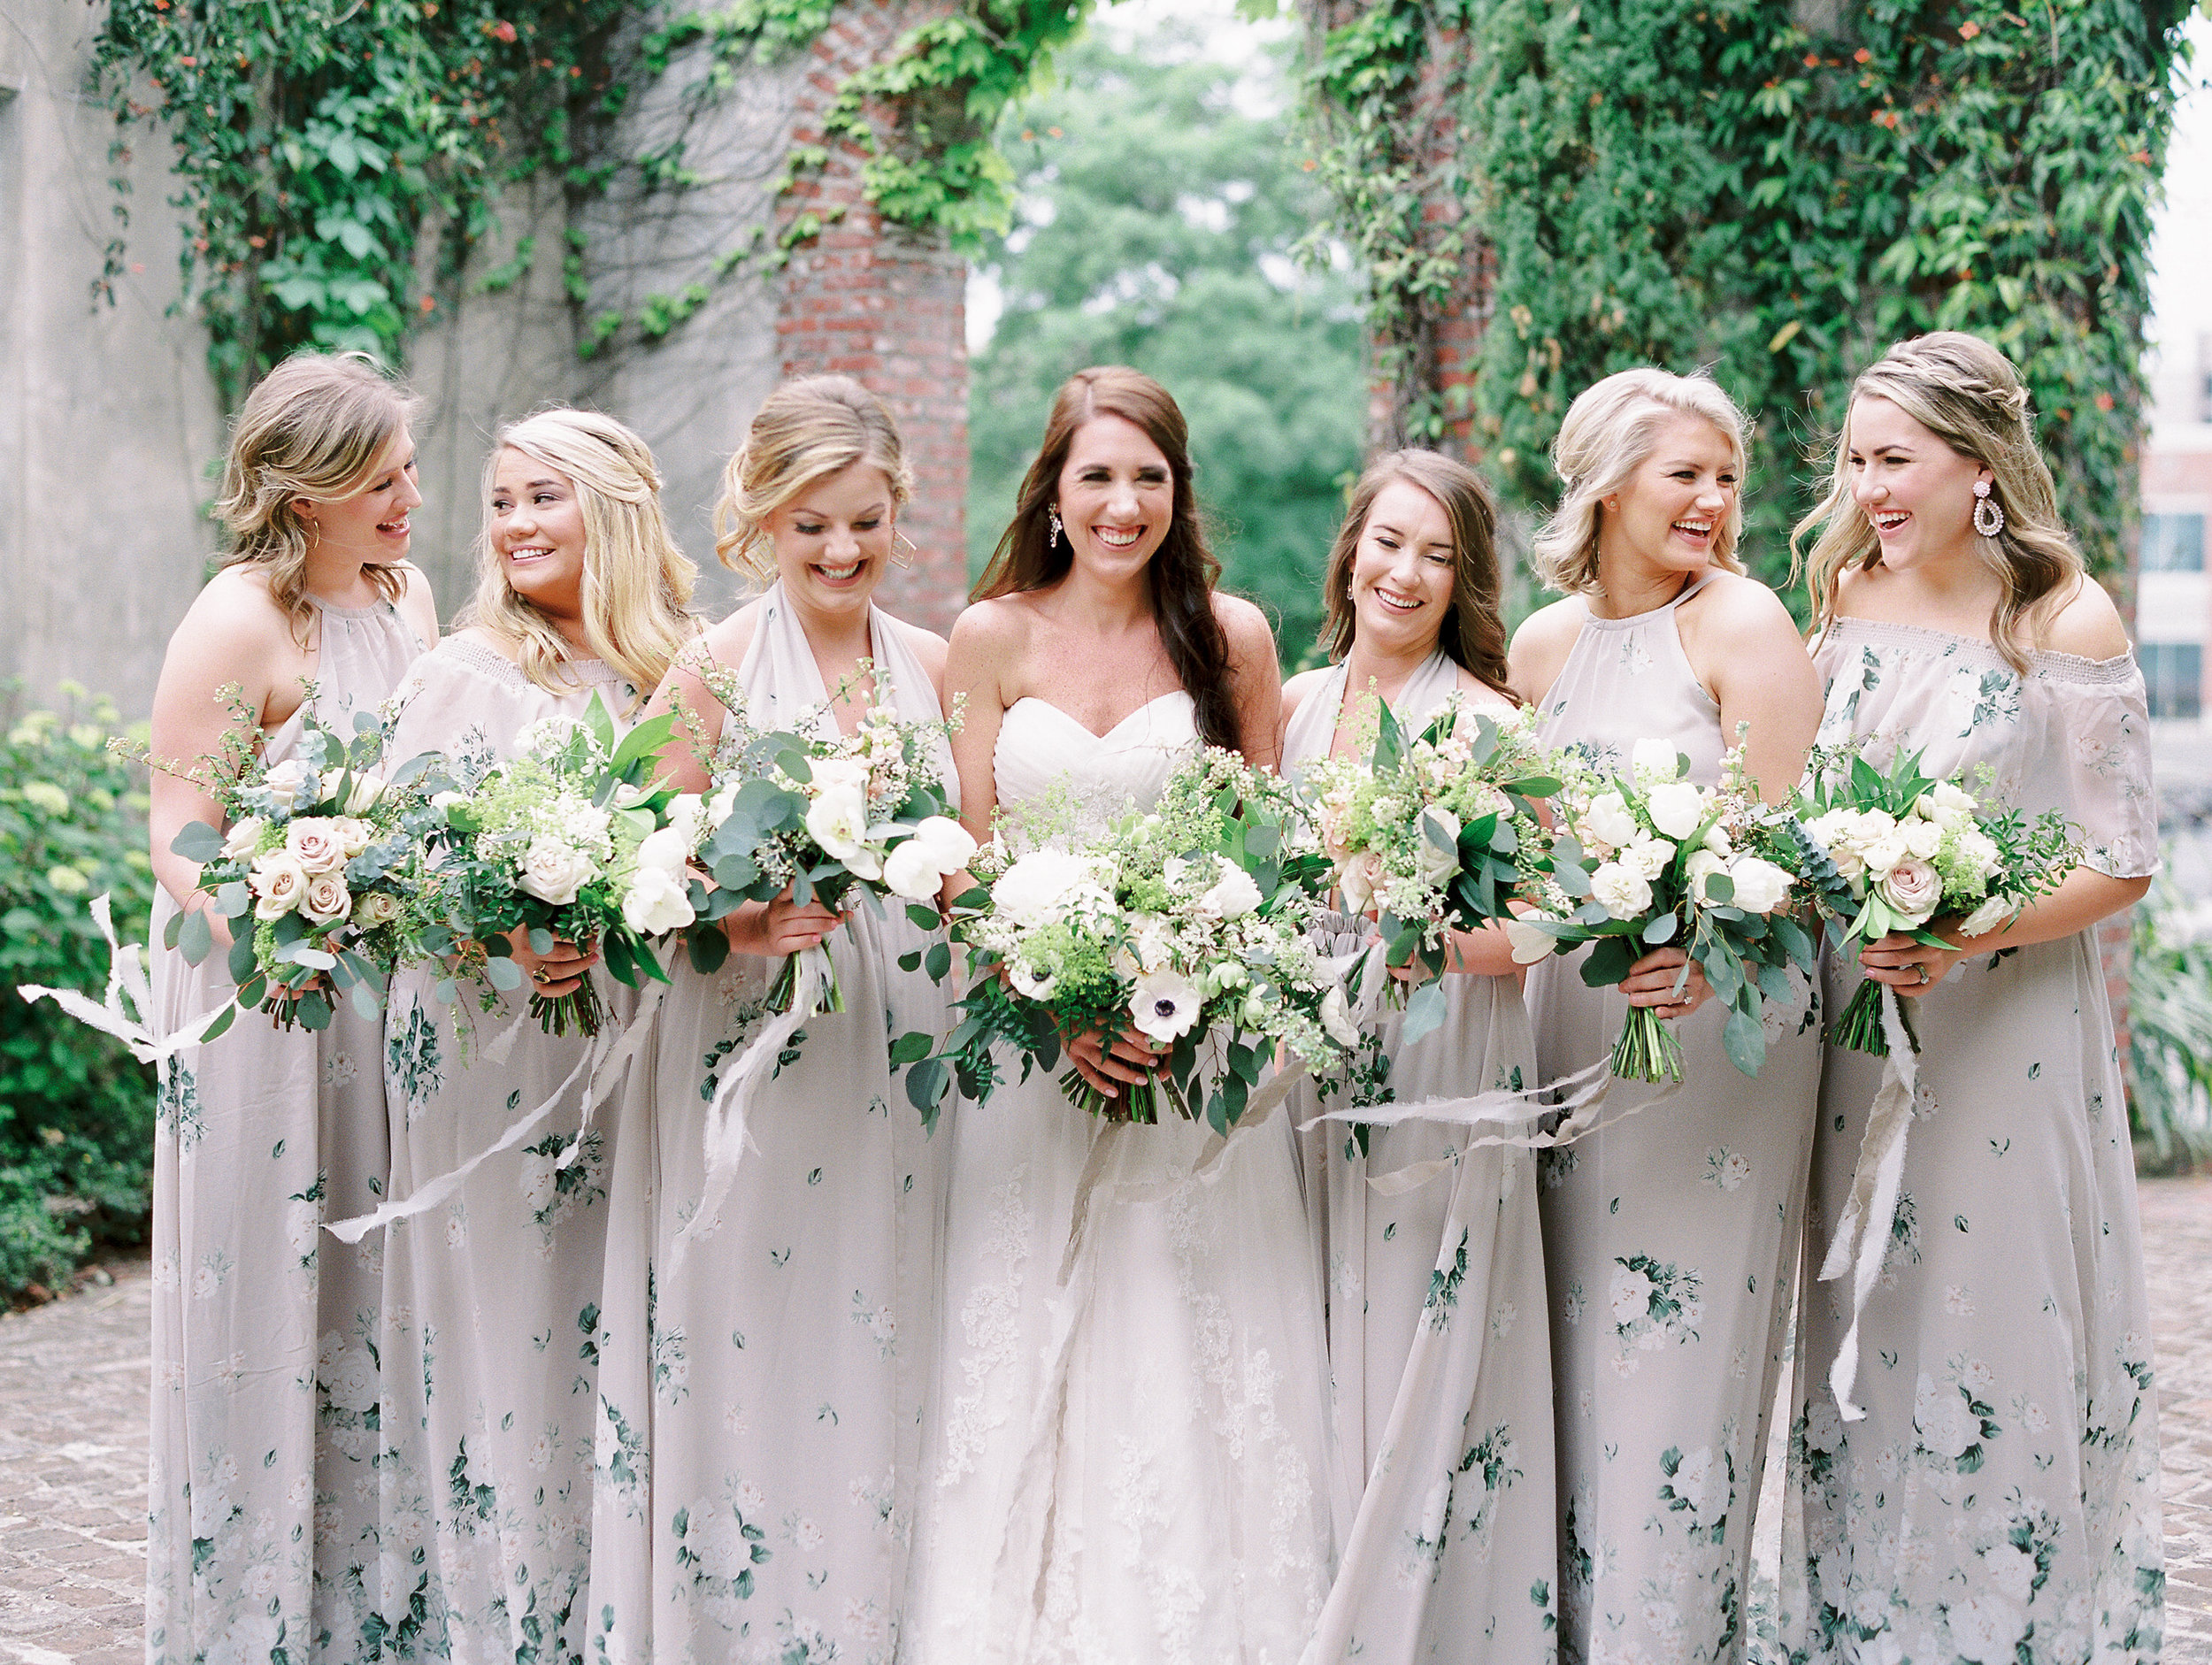 Romantic-Summerour-studio-wedding-hannah-forsberg-atlanta-wedding-photographer27.JPG